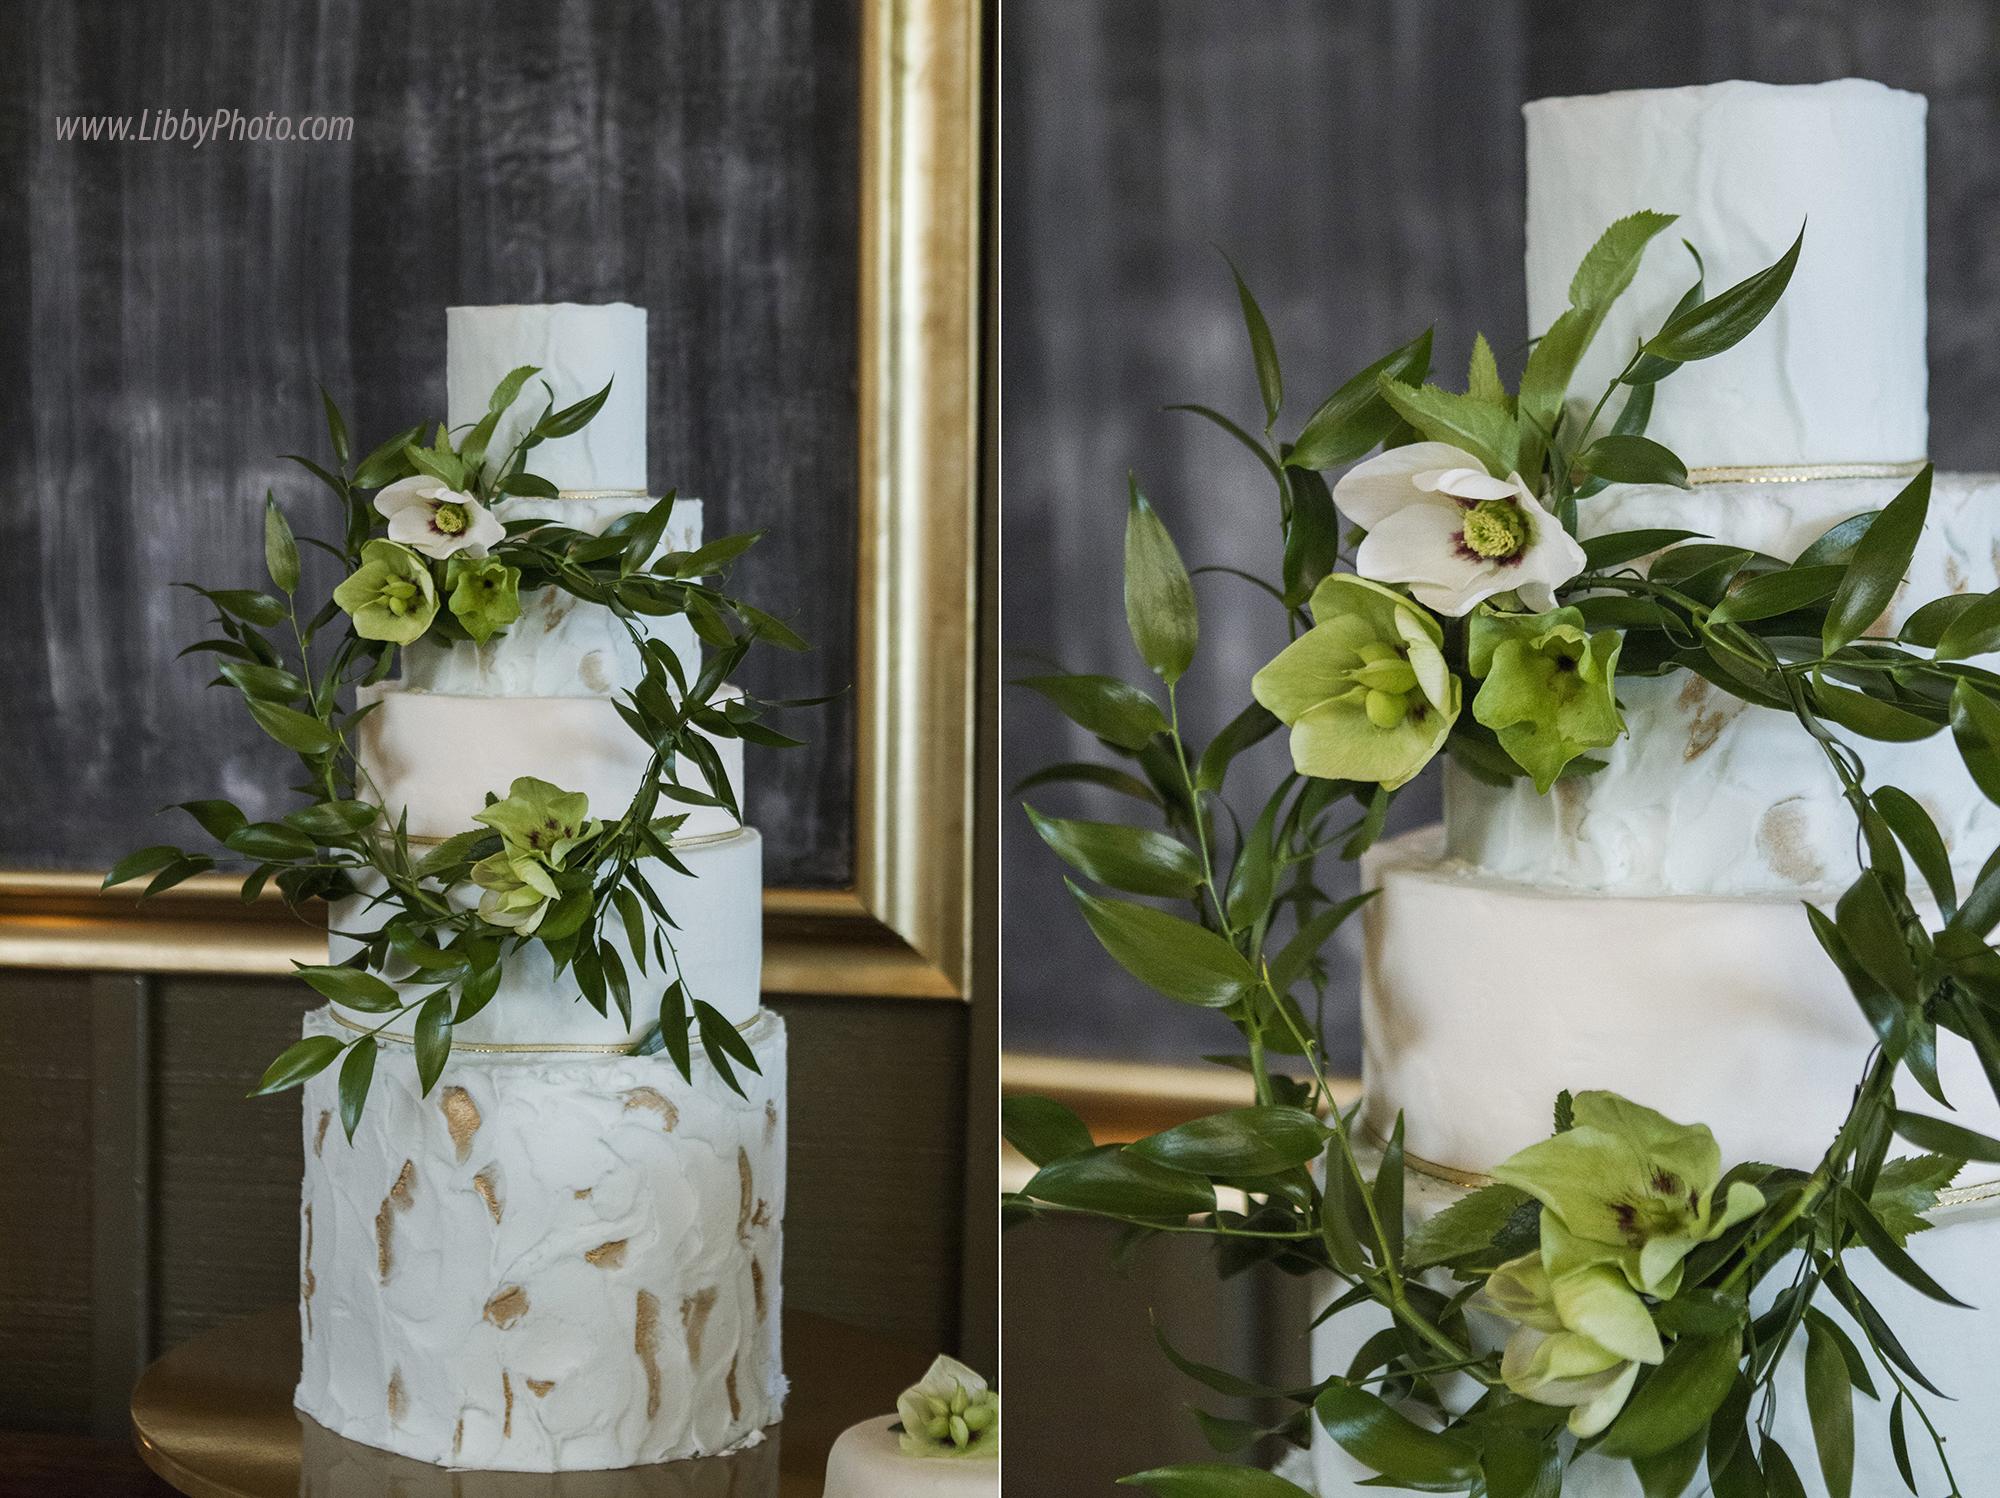 Atlanta wedding photography, Libbyphoto (33).jpg